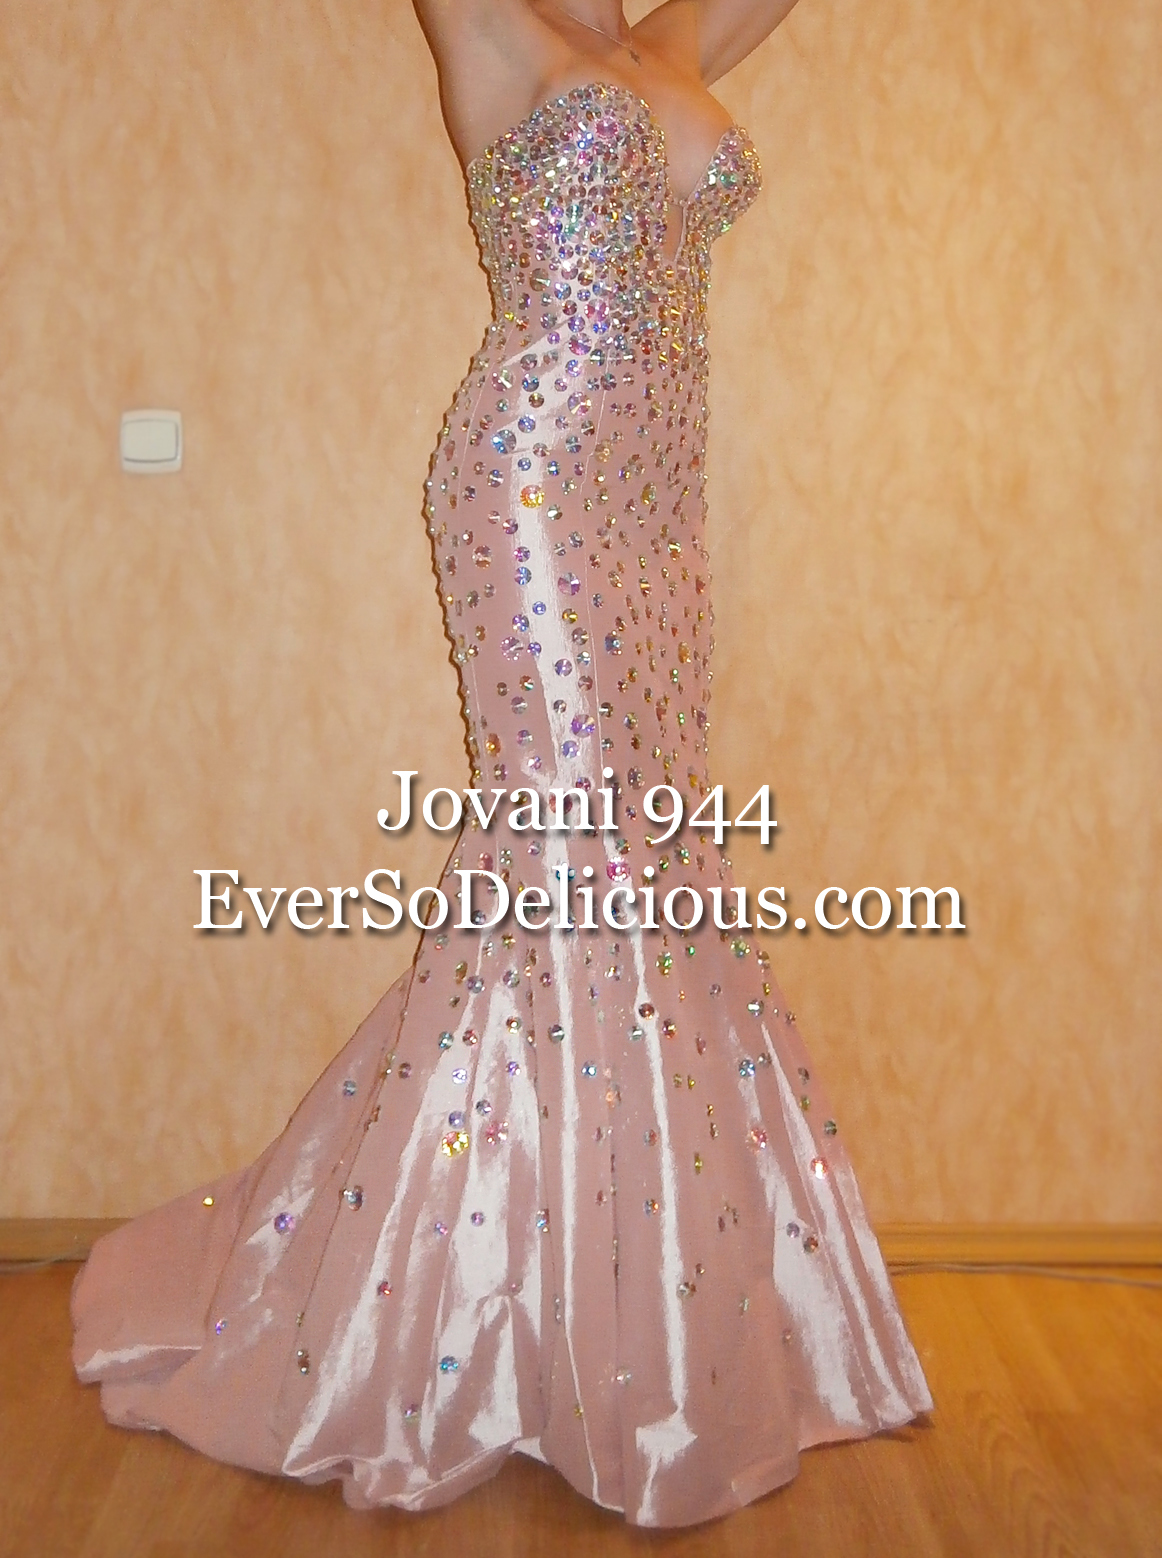 Jovani 944